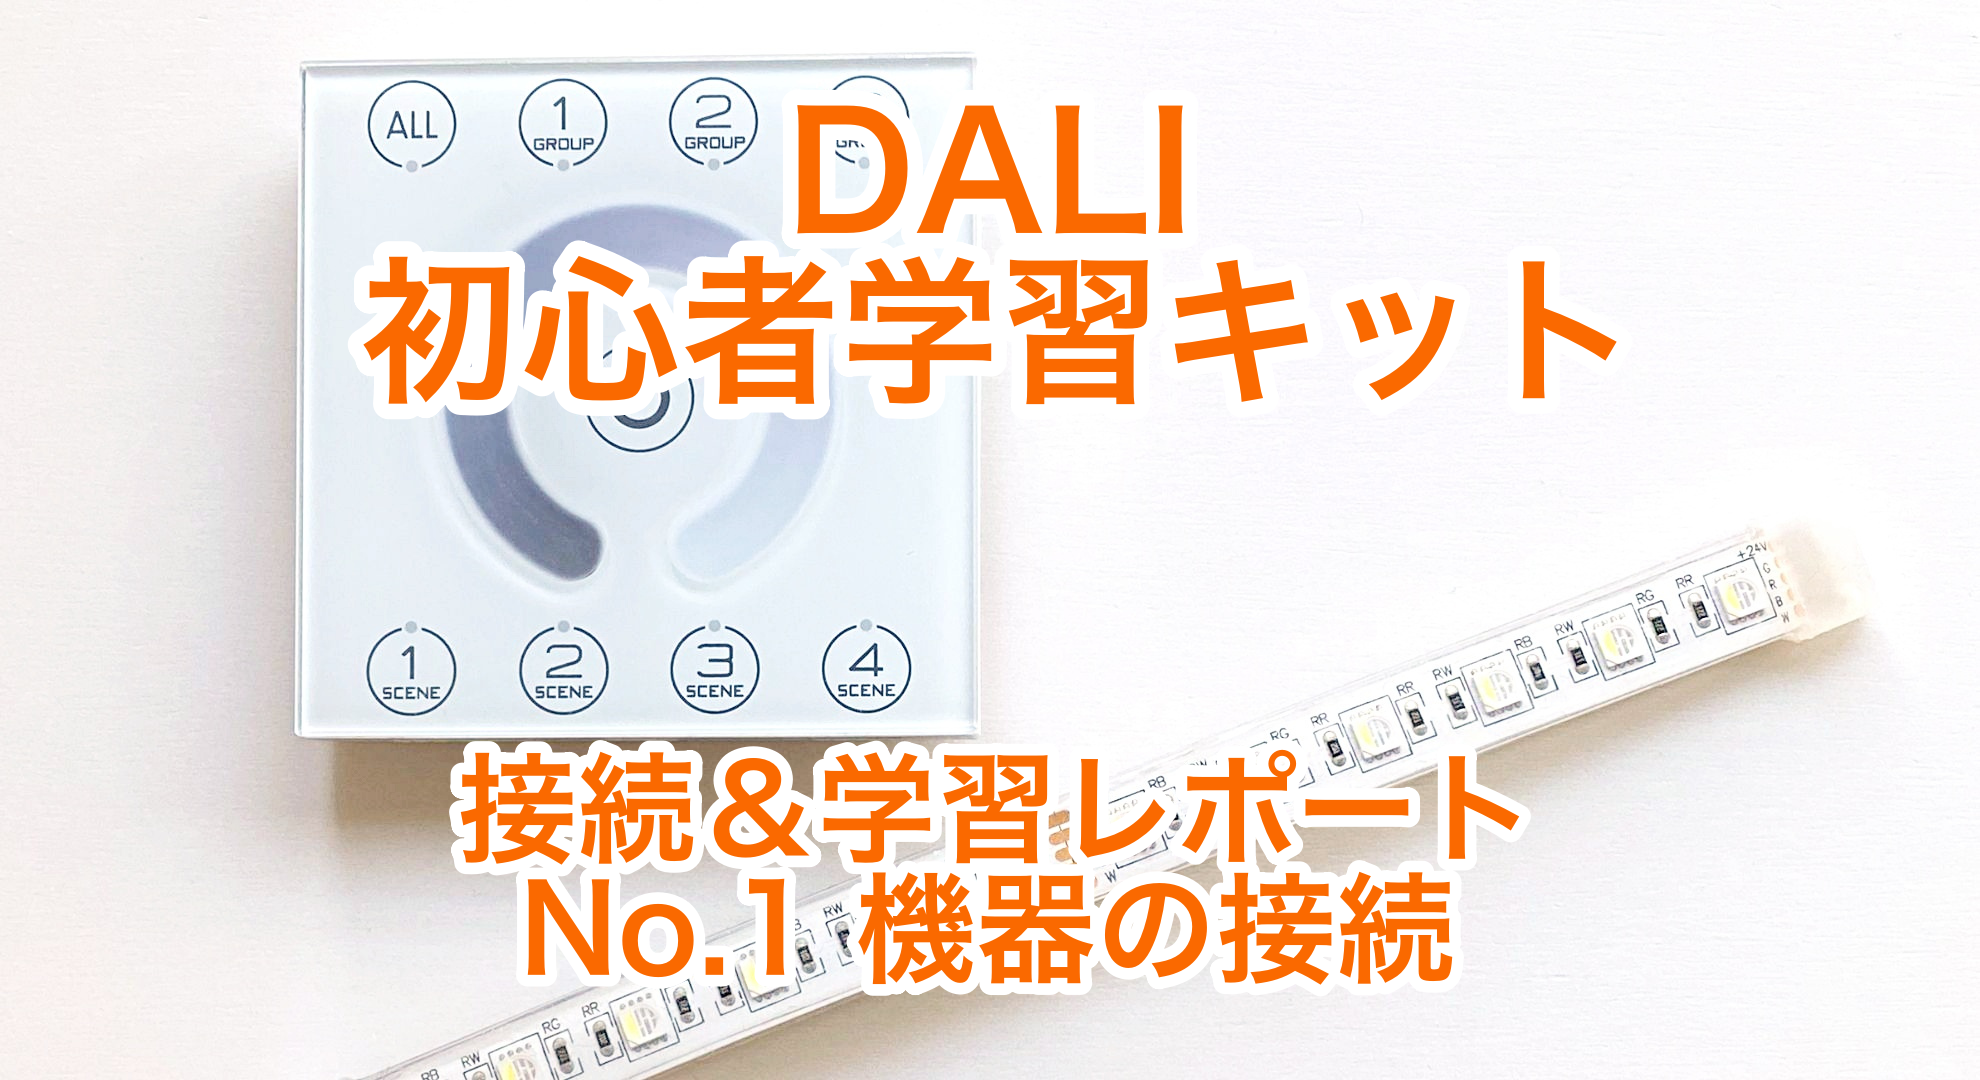 DALI初心者学習キットの接続&学習レポート No.1 機器の接続